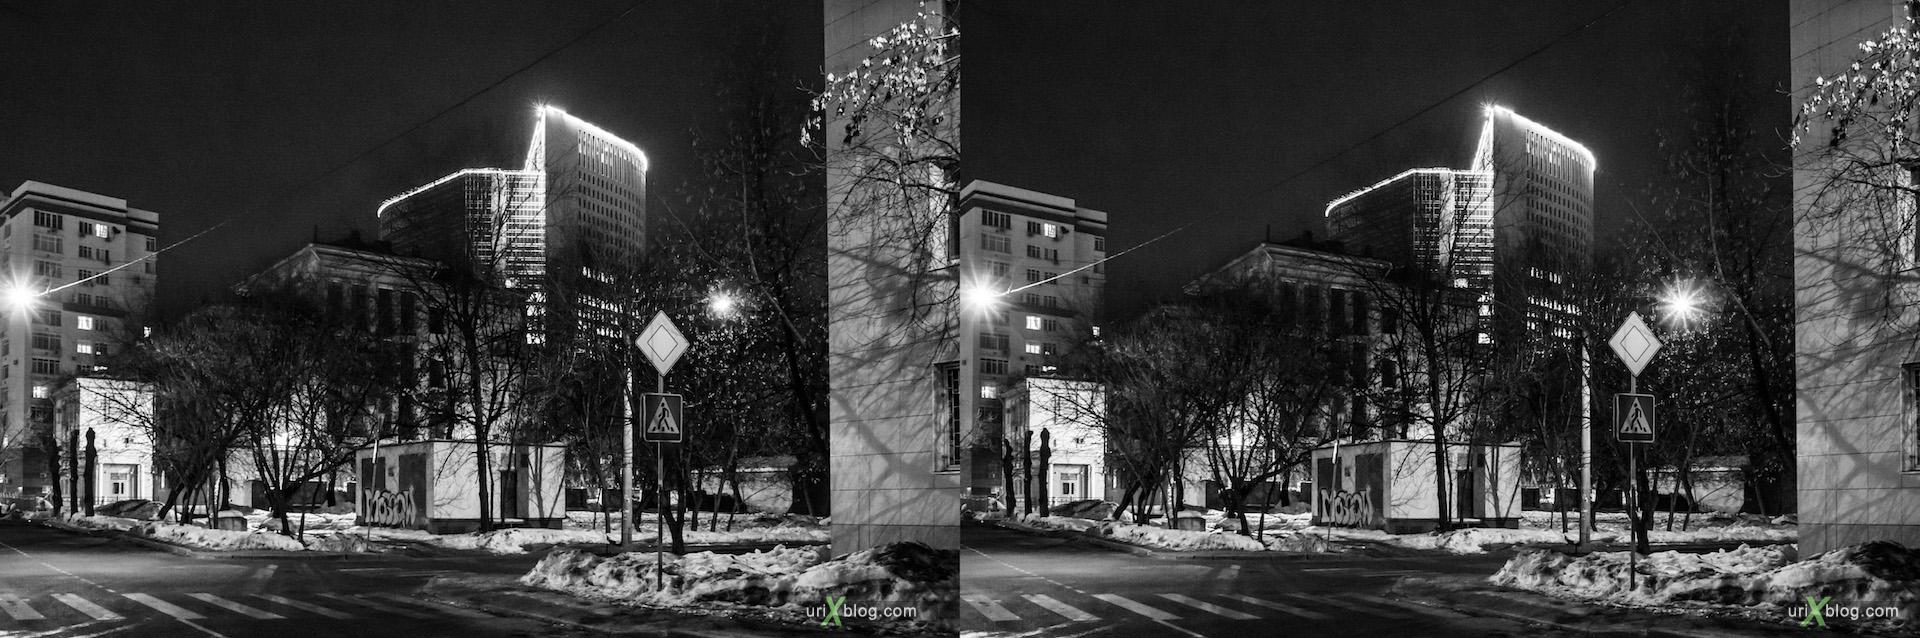 2013, Buzheninova street, night, evening, Moscow, Russia, winter, snow, dust, lantern, tree, building, 3D, stereo pair, cross-eyed, crossview, cross view stereo pair, stereoscopic